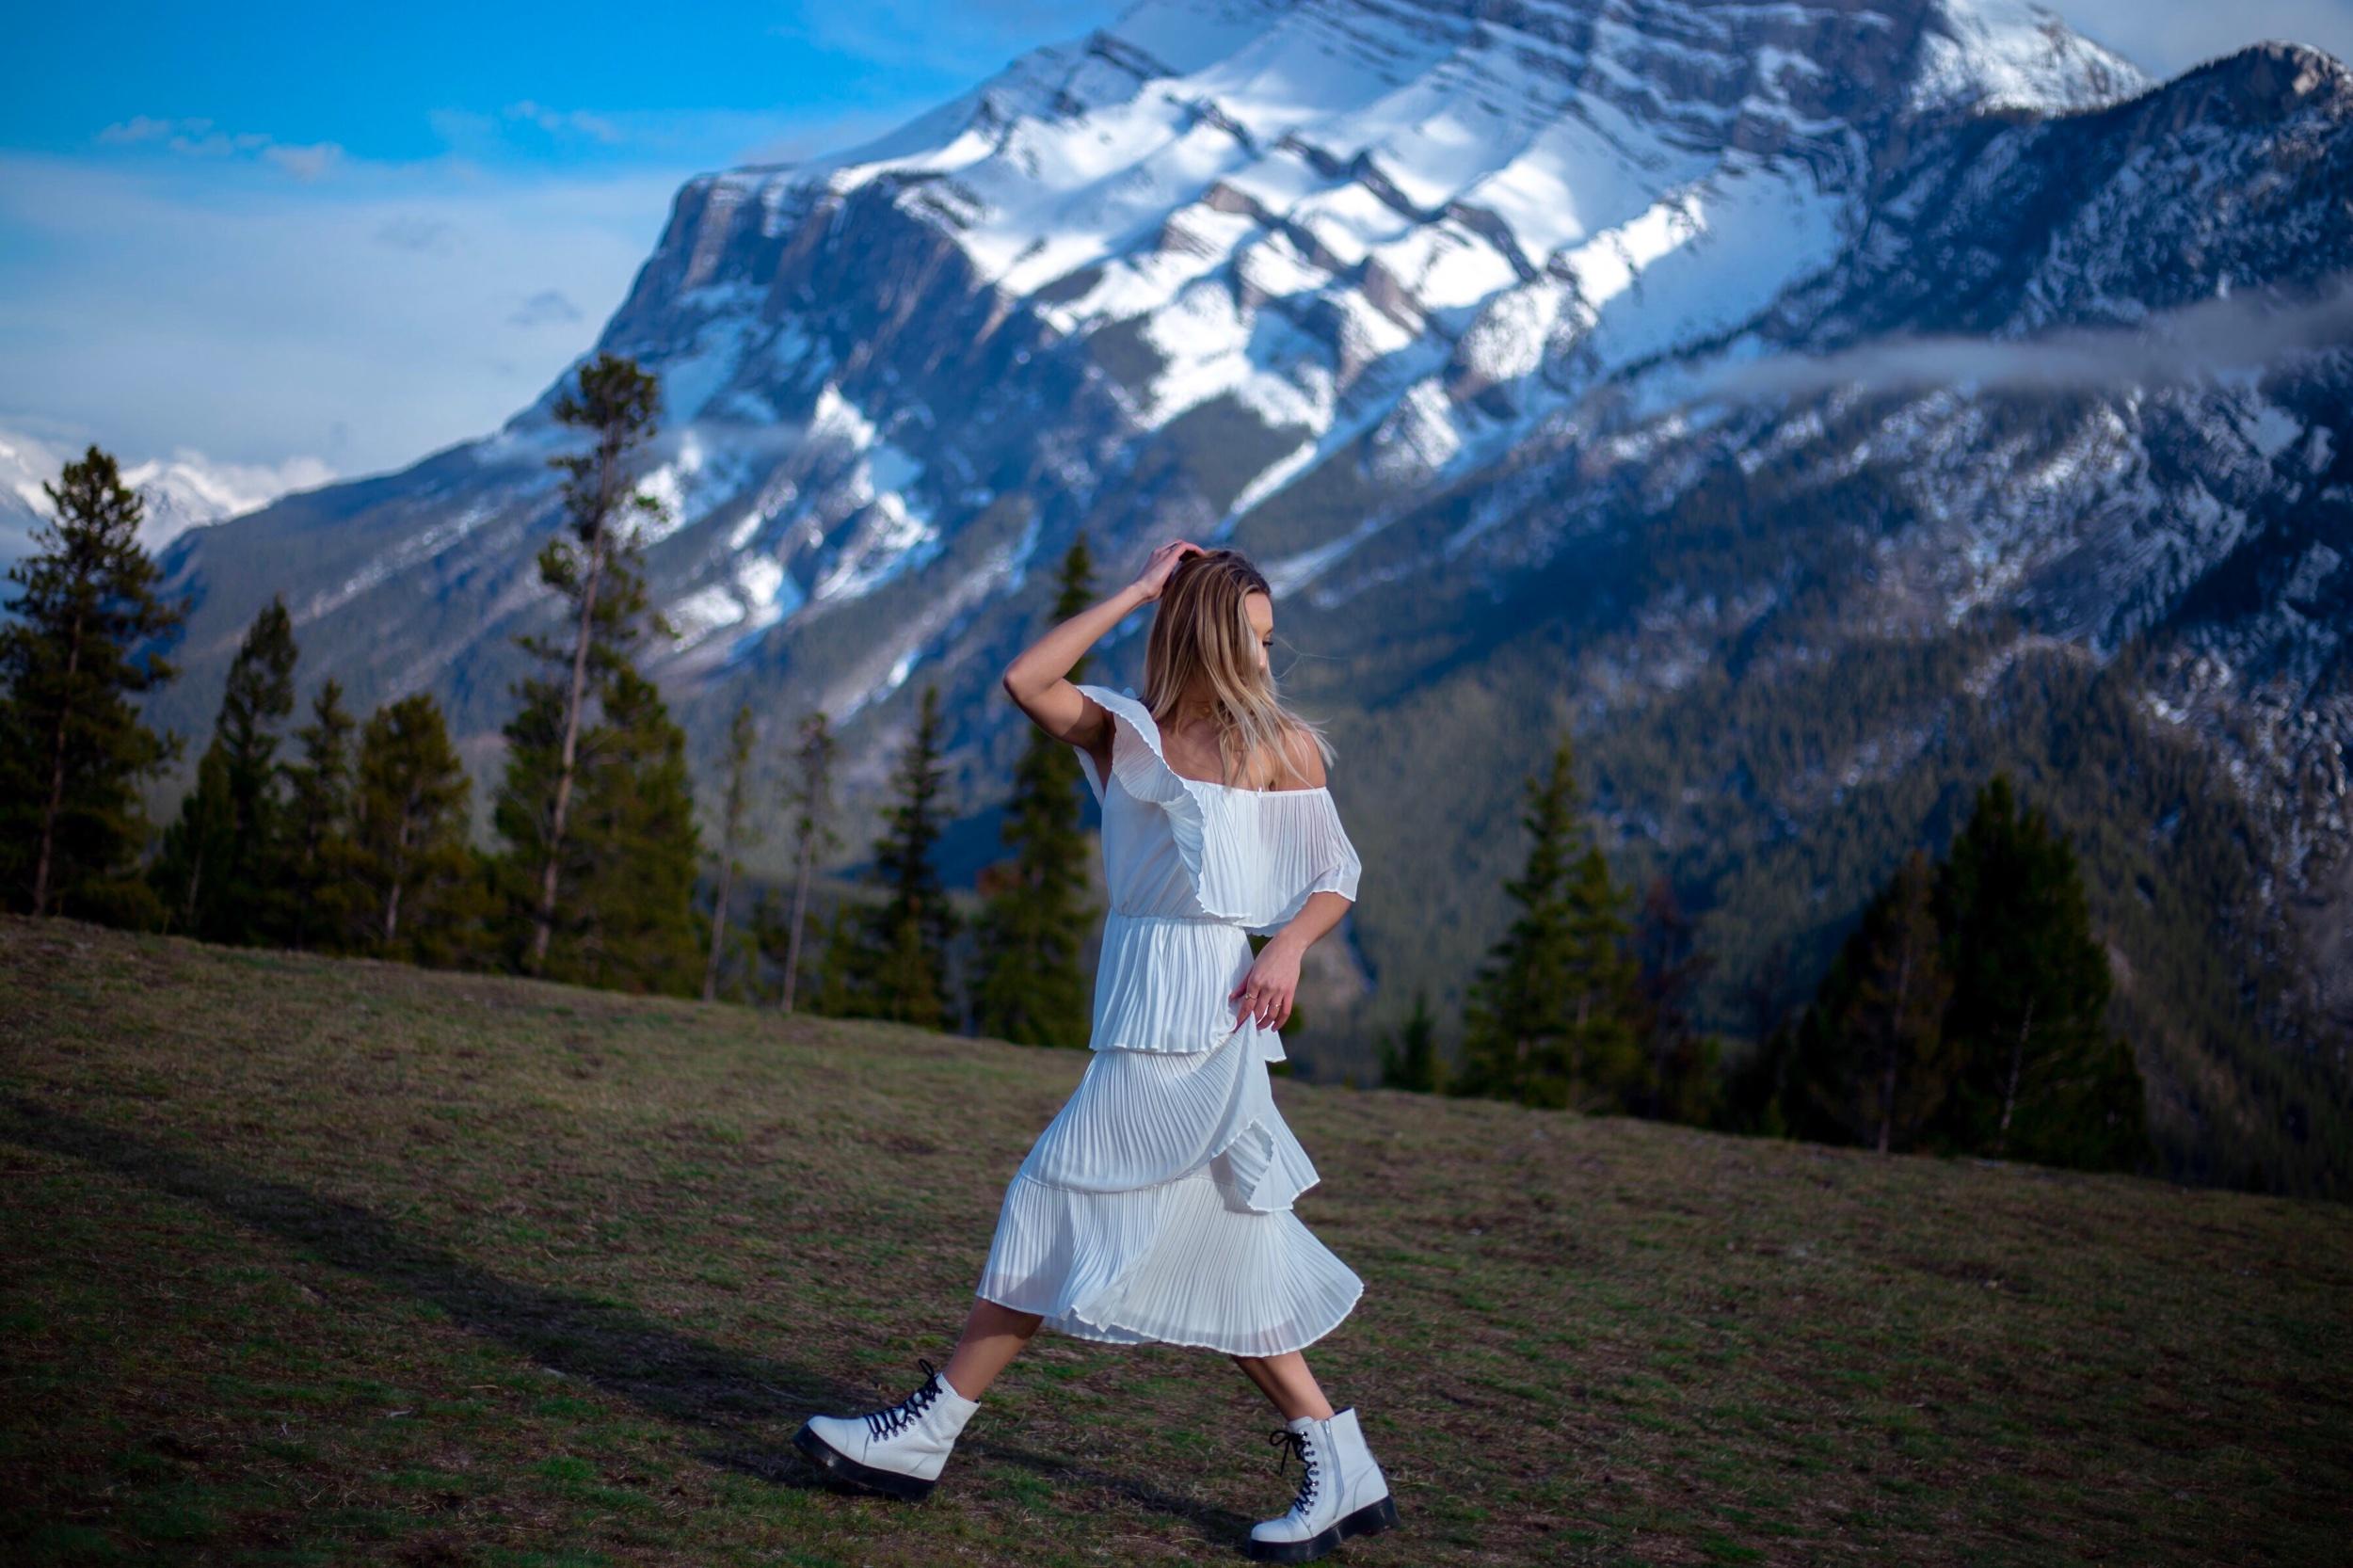 banff alberta photoshoot photography portrait brittanylaurens explore outdoor brittany lauren